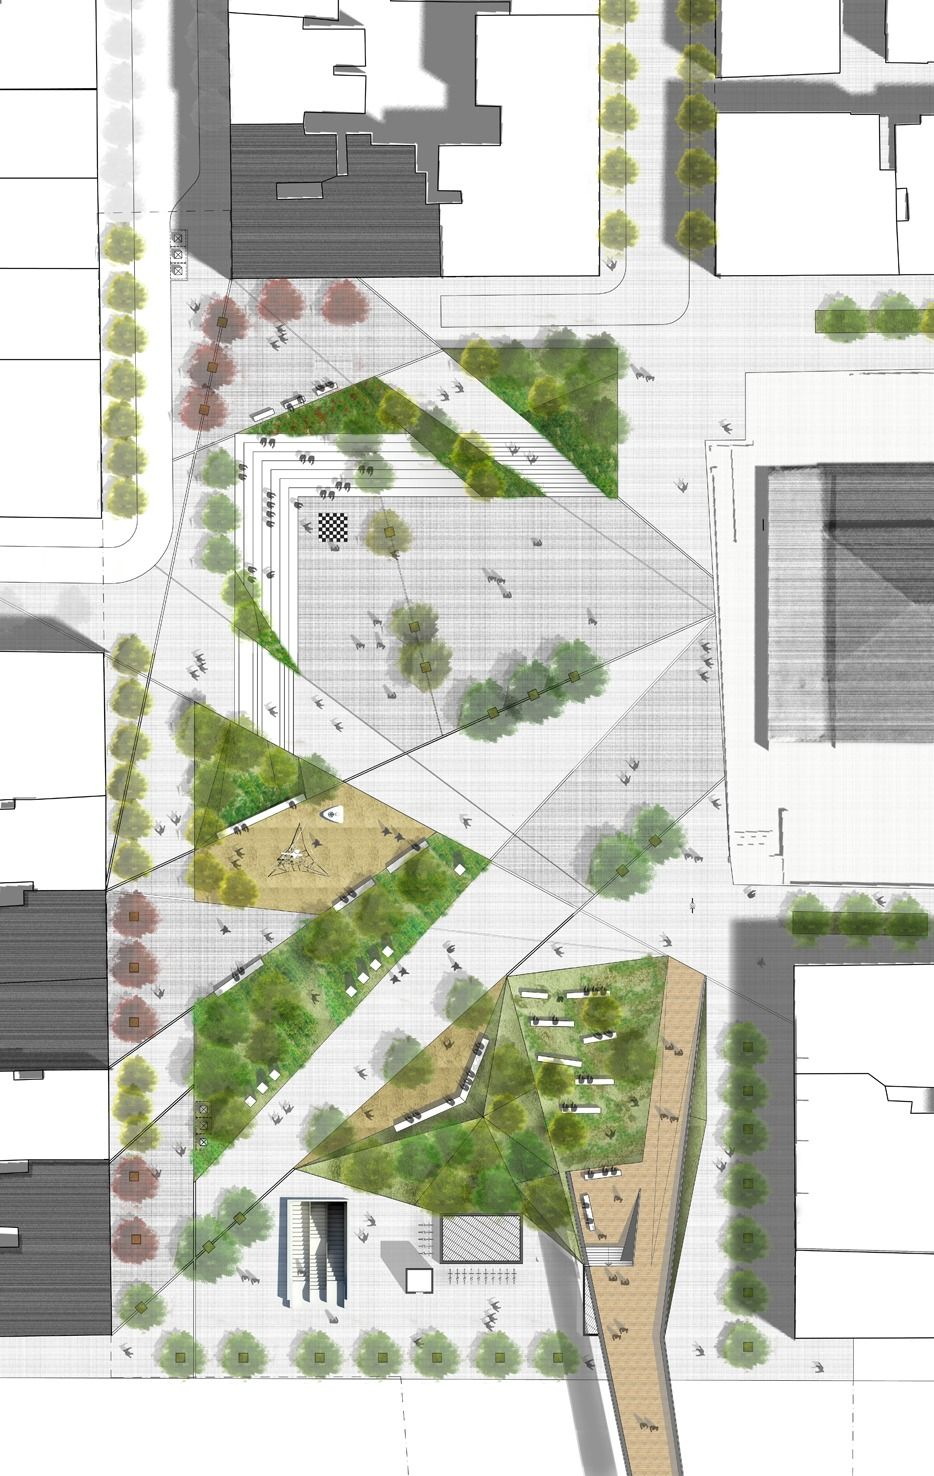 Thessaloniki public square redesign proposal design g for Garden design proposal